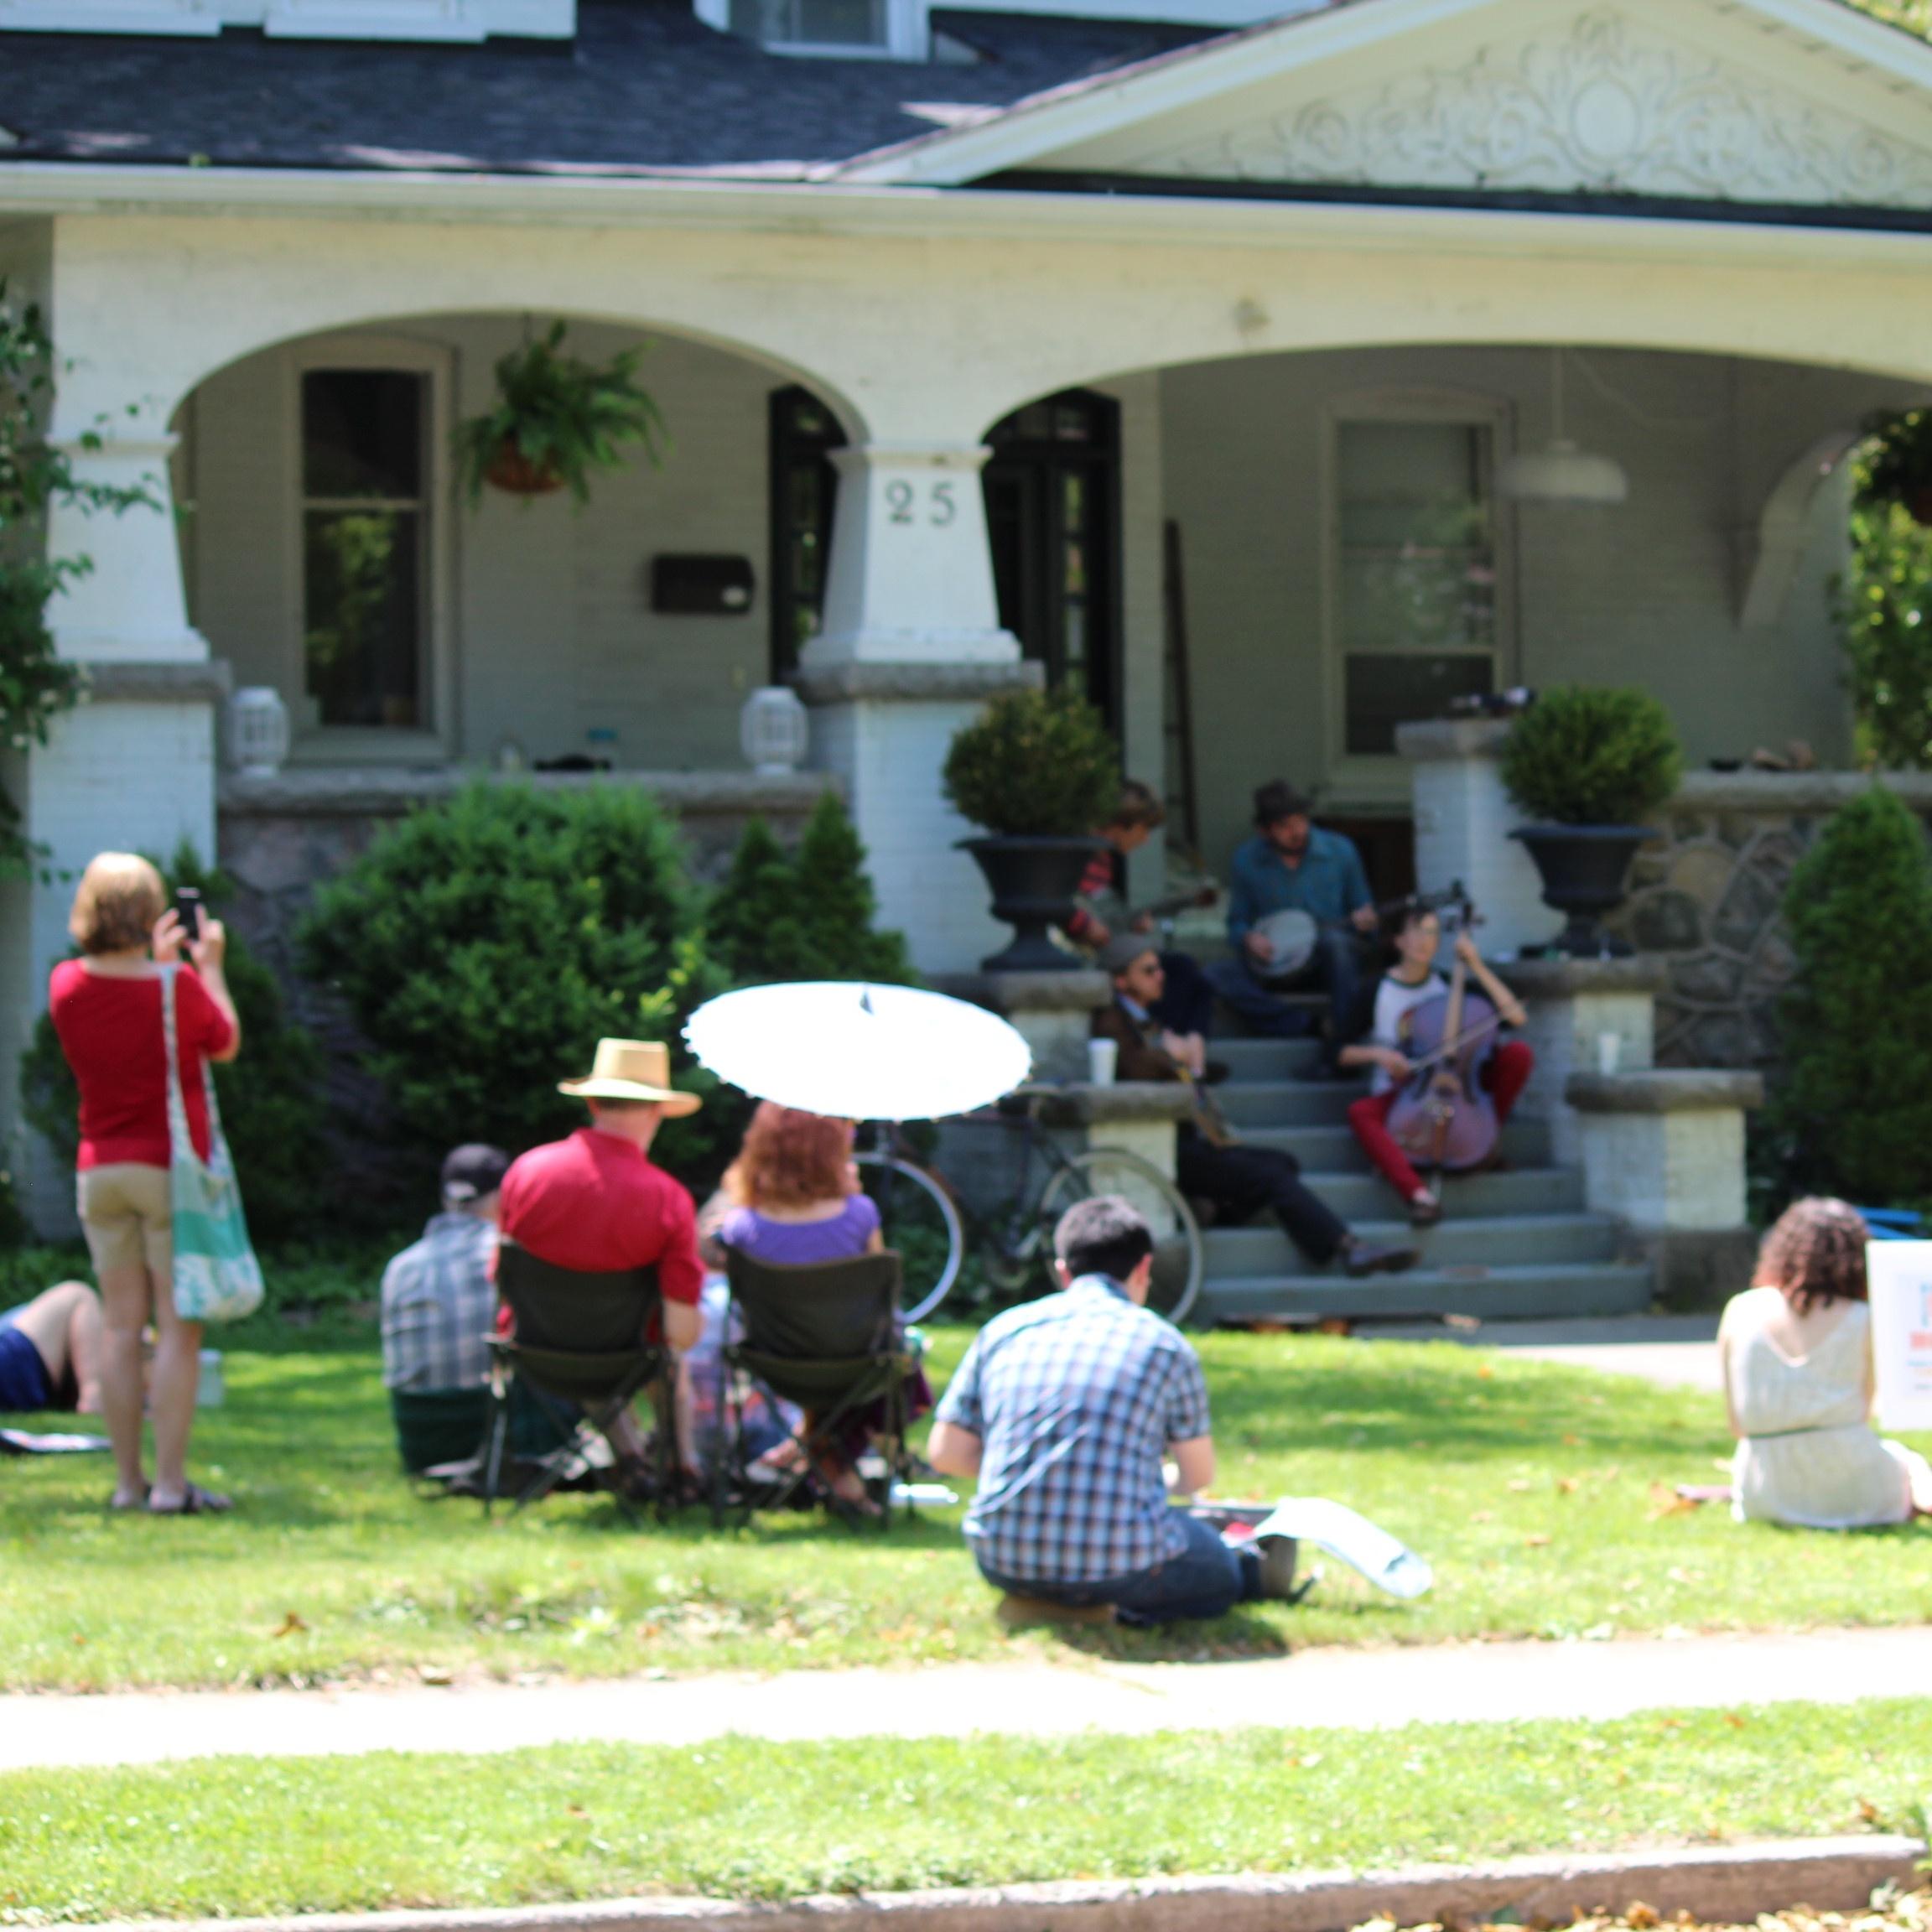 Community_Images_Neighbours01-162997-edited.jpg